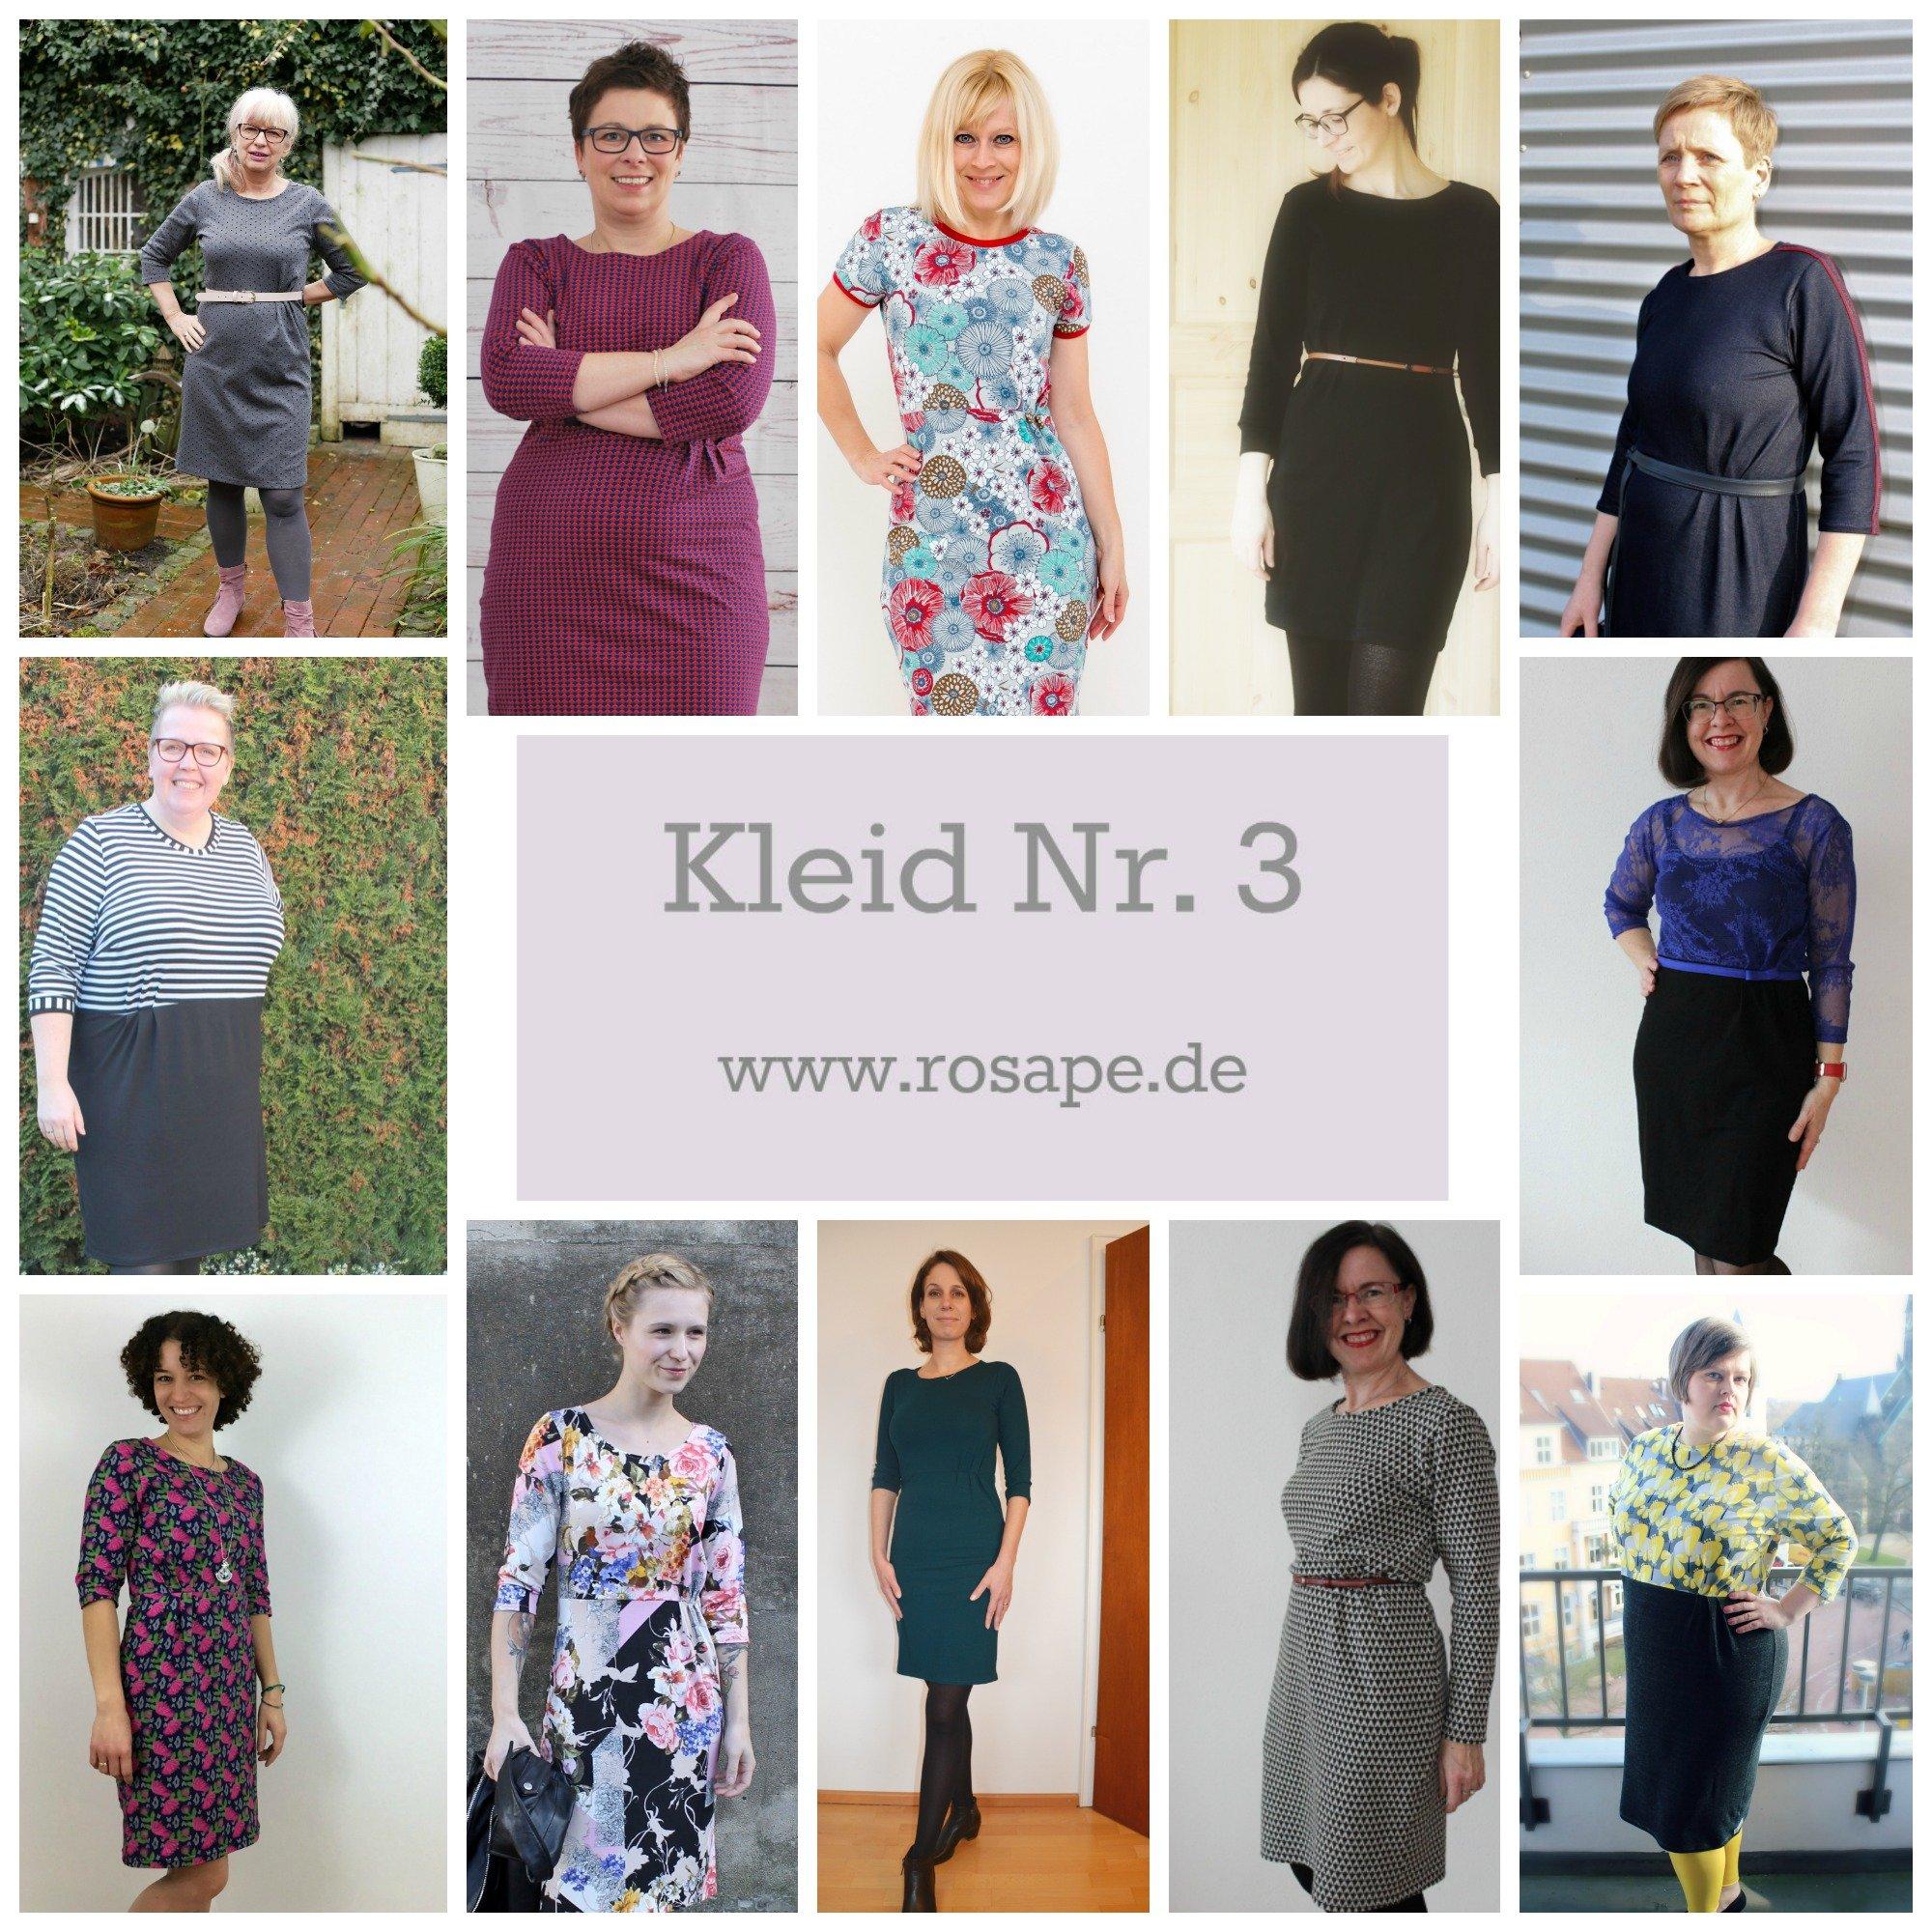 Neues rosa p. Schnittmuster: Kleid Nr. 3 und Kleid Nr. 3 PLUS ...